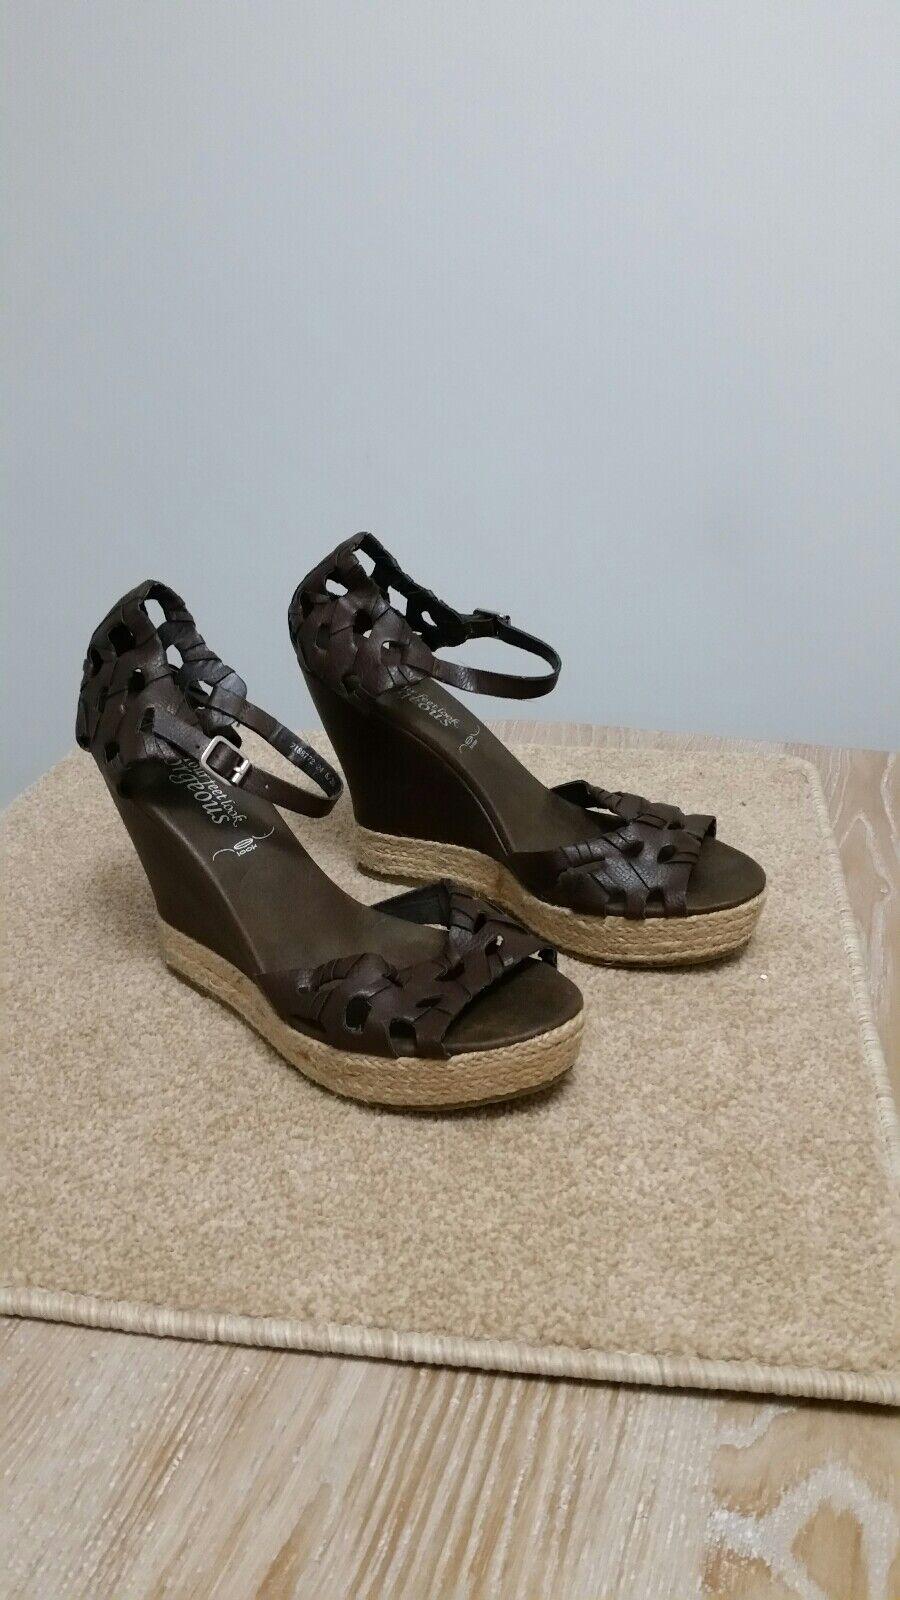 Womens New brown wedge sandals. New Womens Look uk size 6 080eee